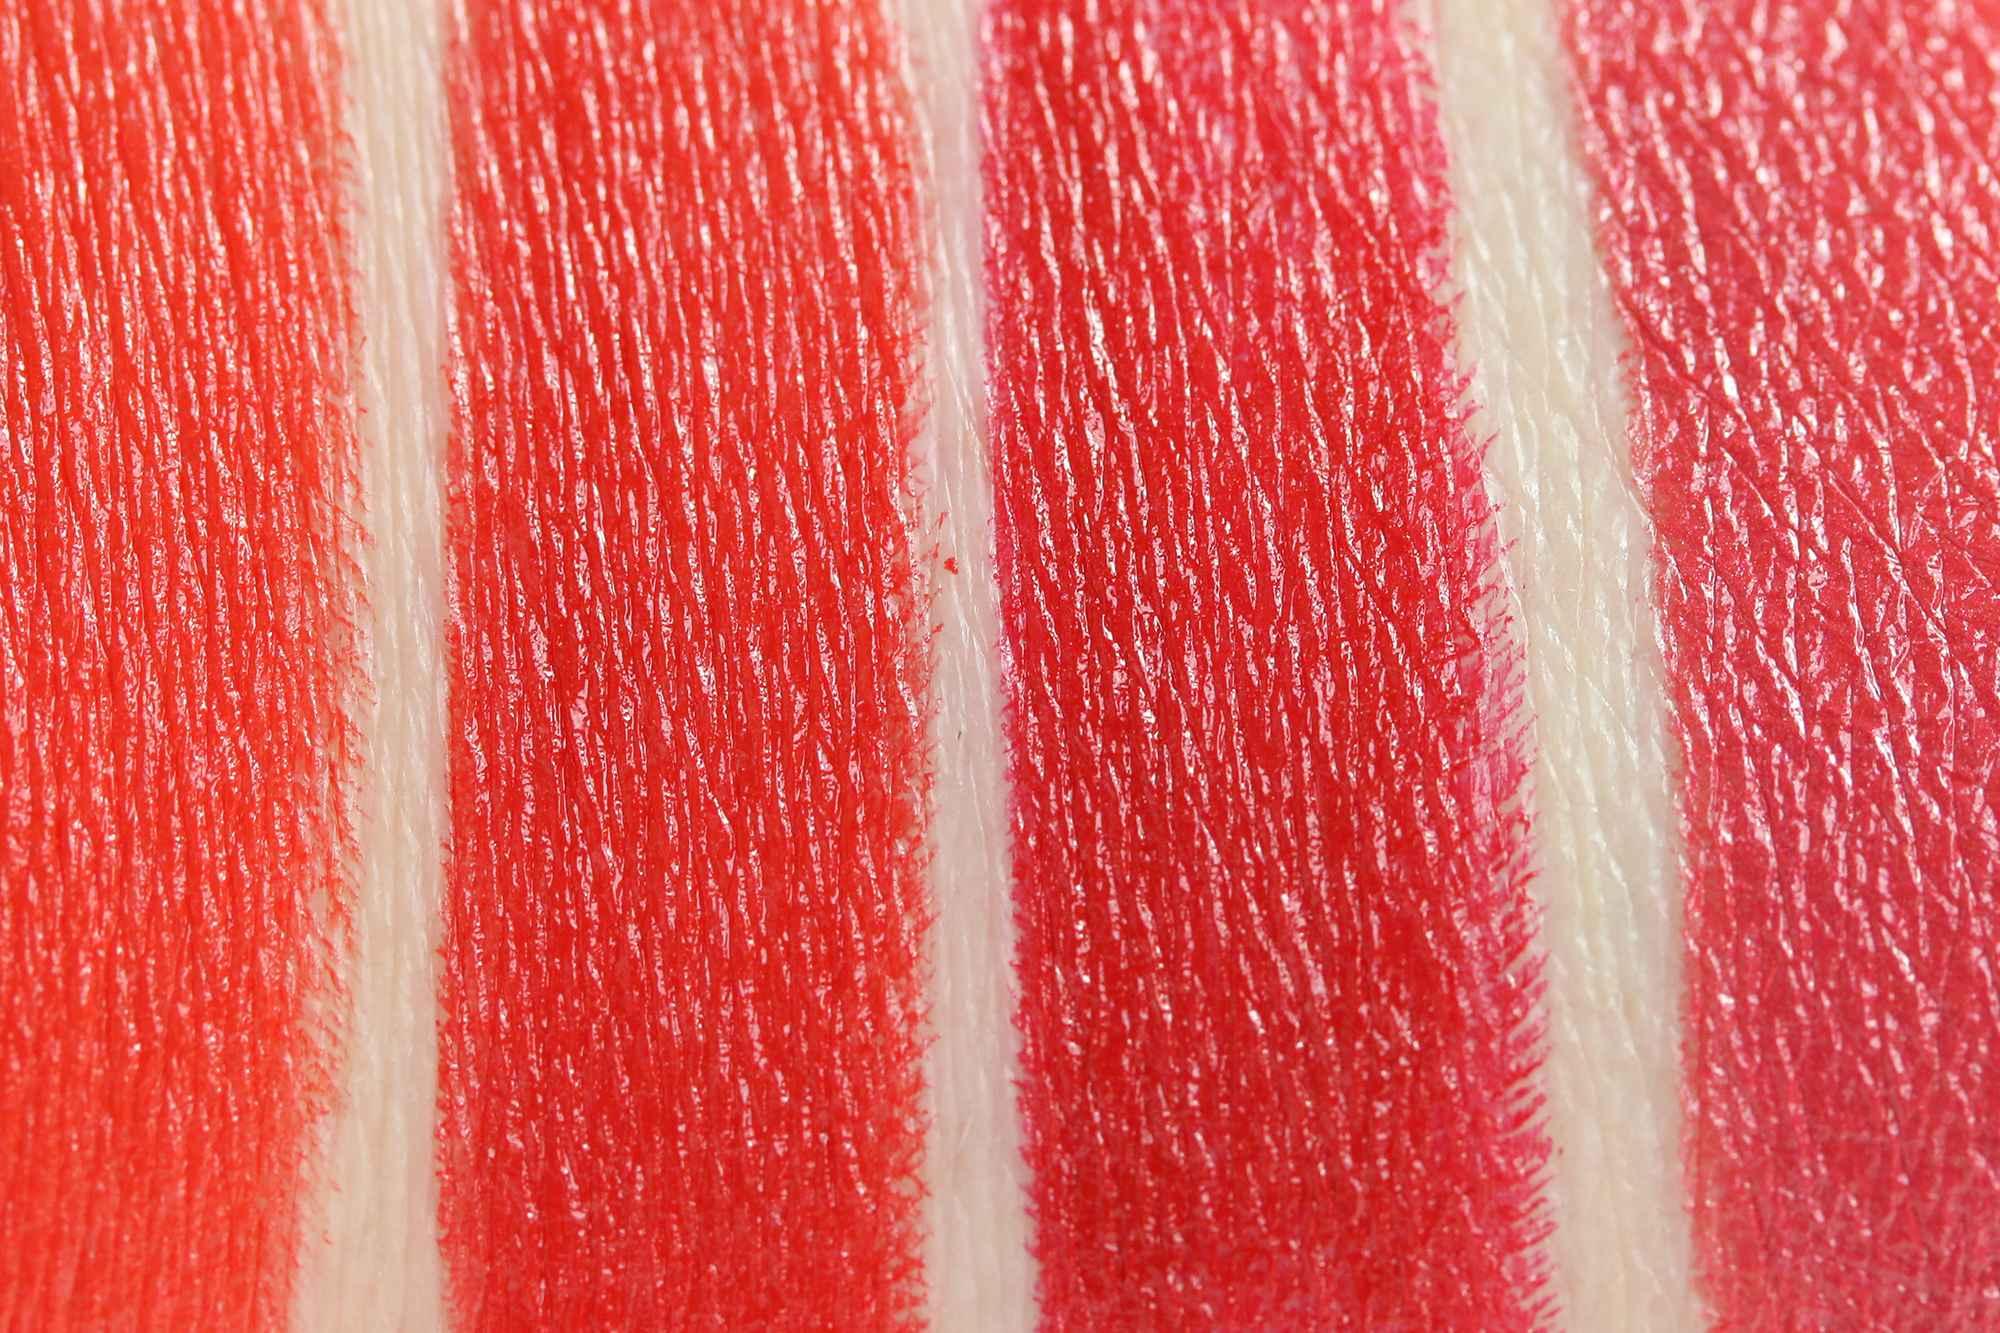 LIPaffair Color & Care Lippenstift Swatches InnenAussen 3